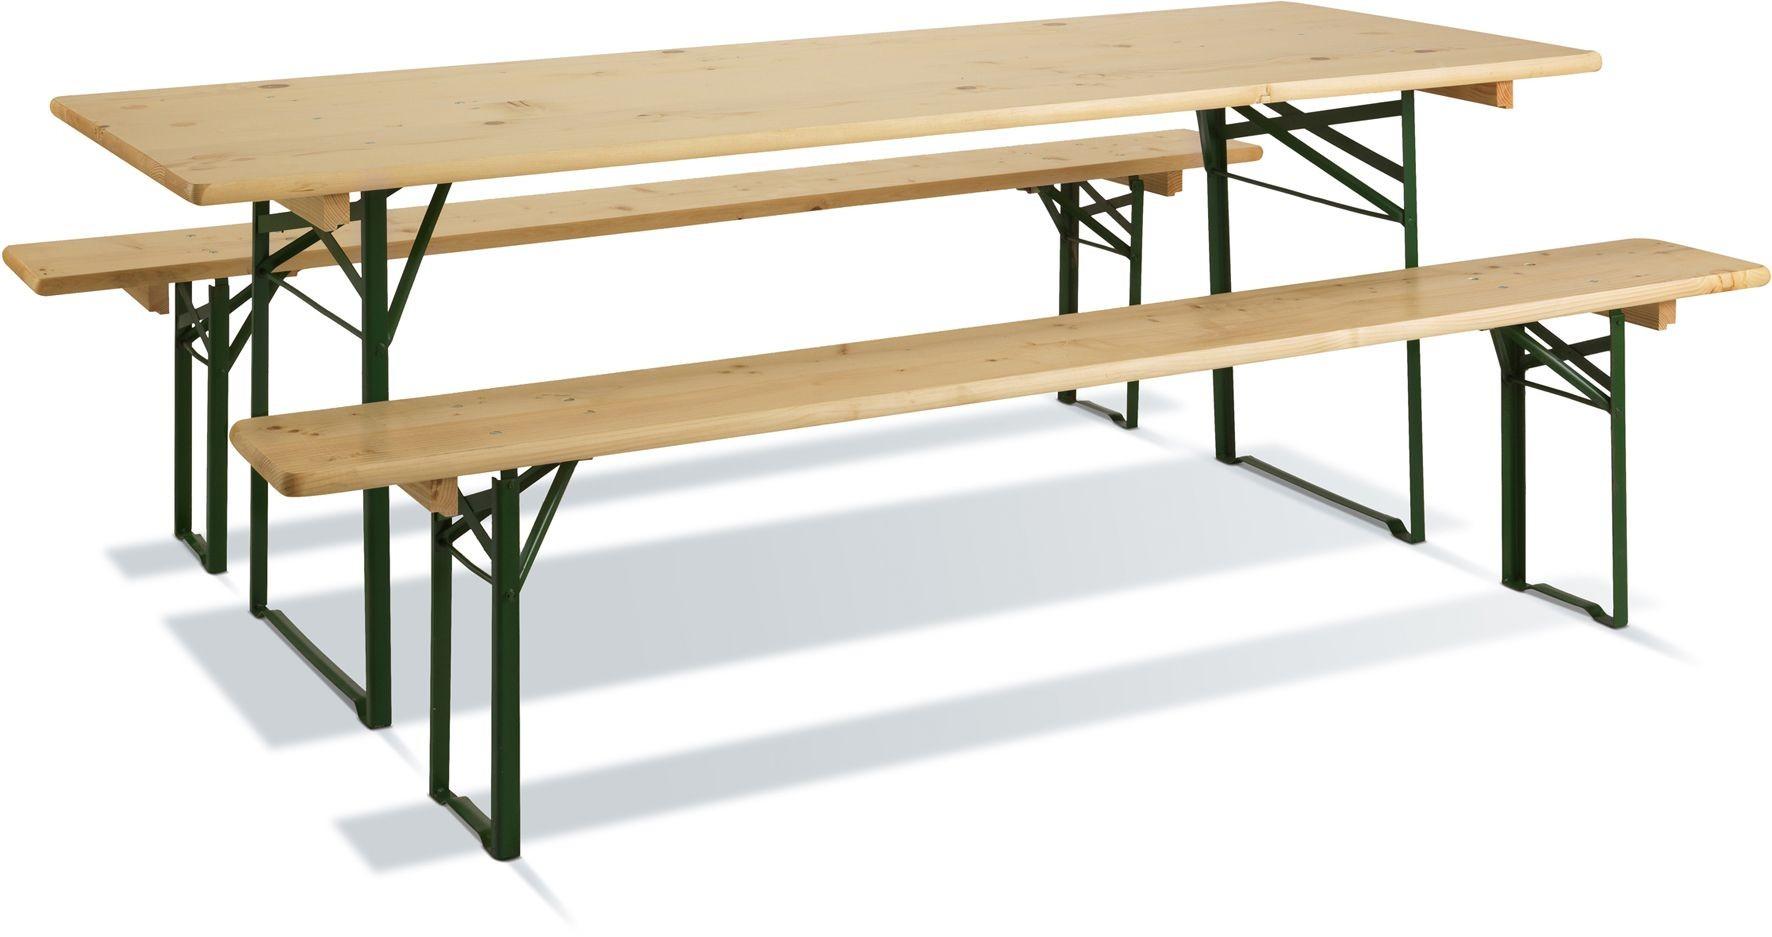 Table de pic-nic en bois Brasseurs 220 cm